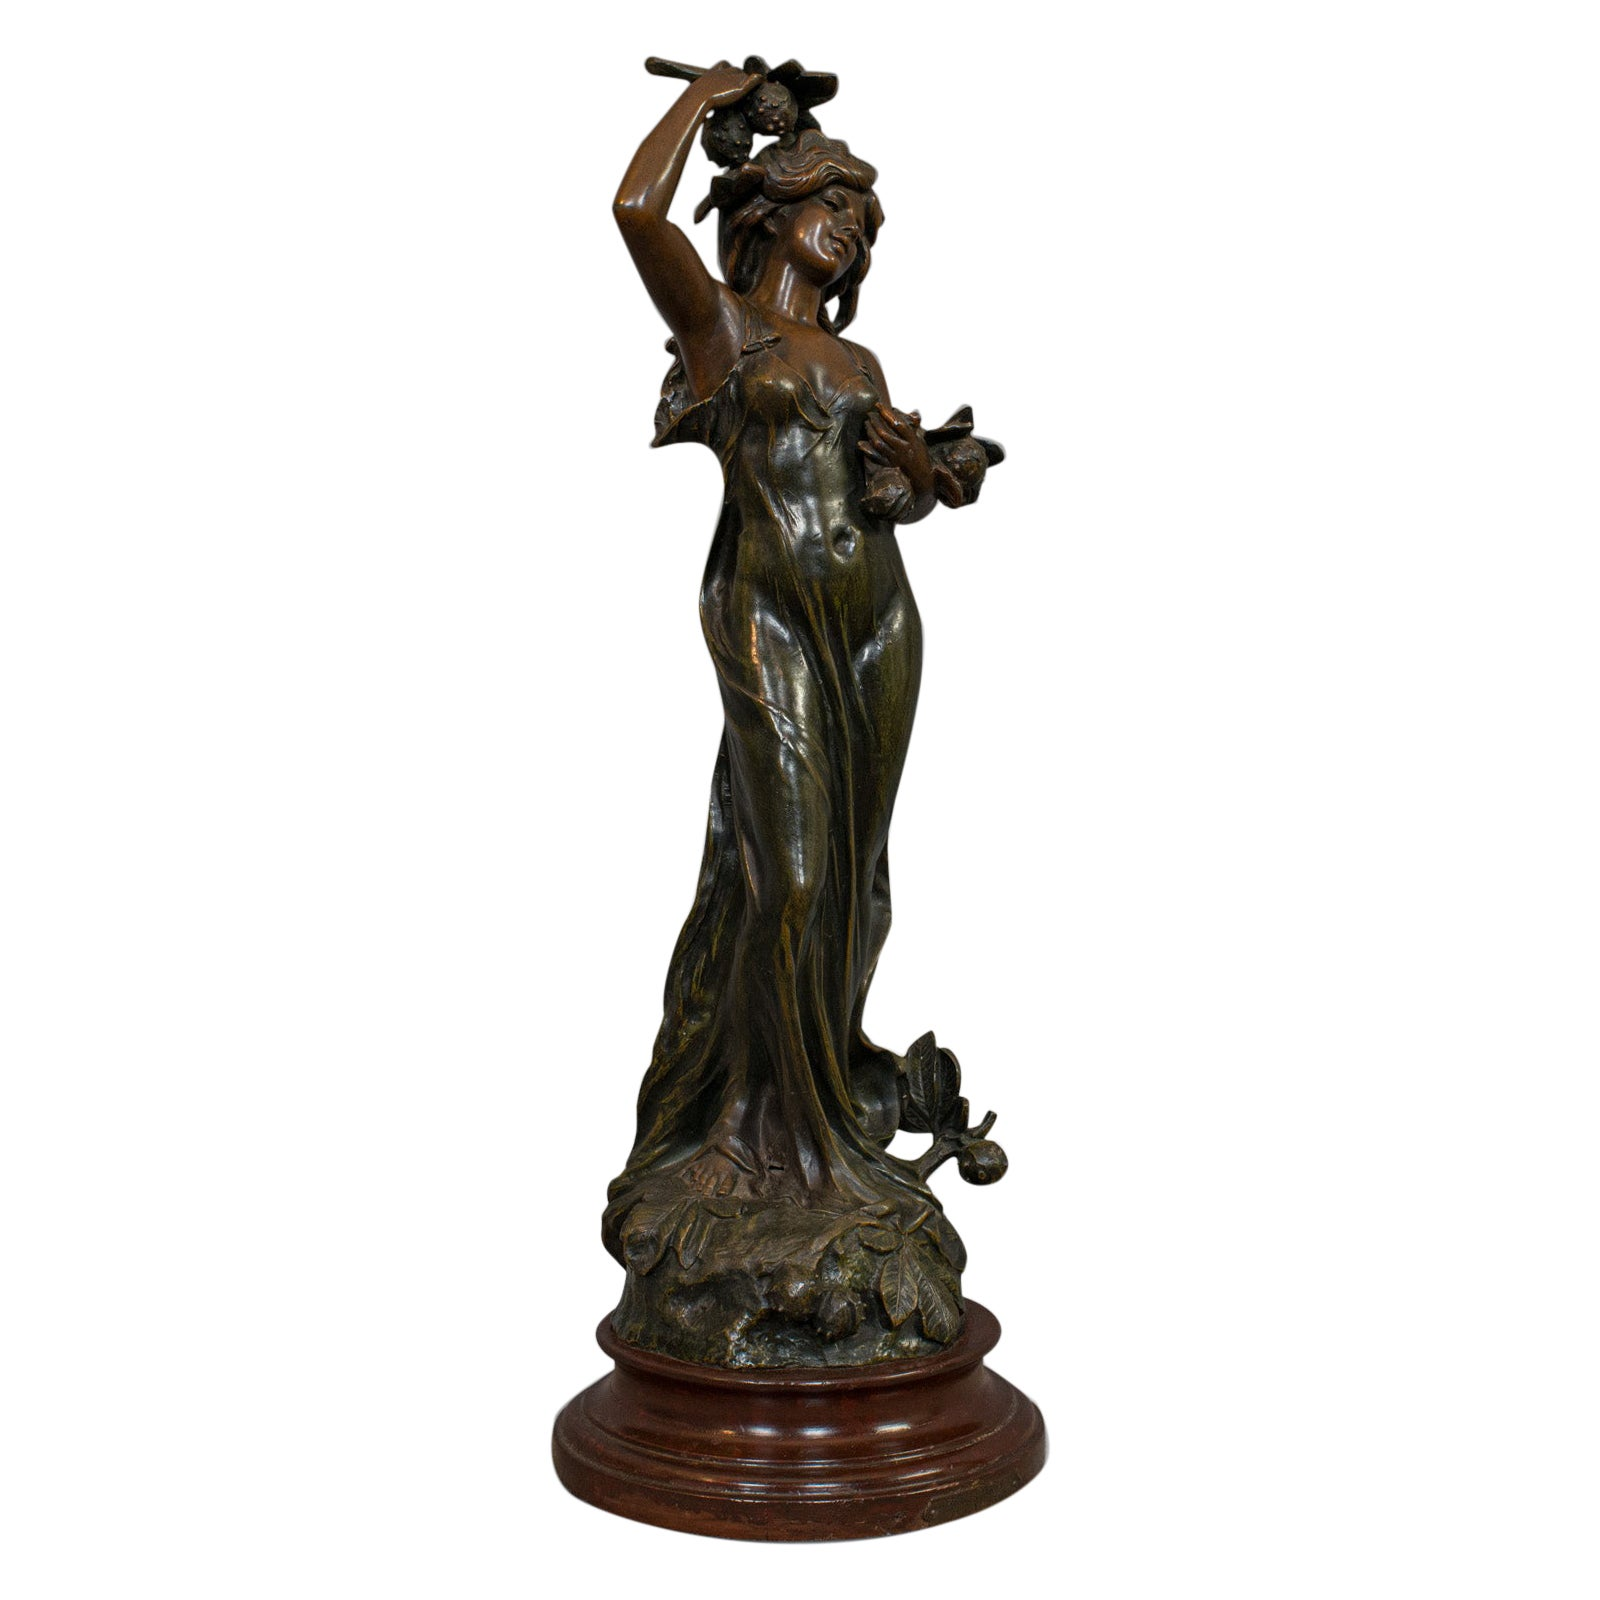 Antique Female Figure, French, Bronze Spelter, Statue, Art Nouveau, circa 1920